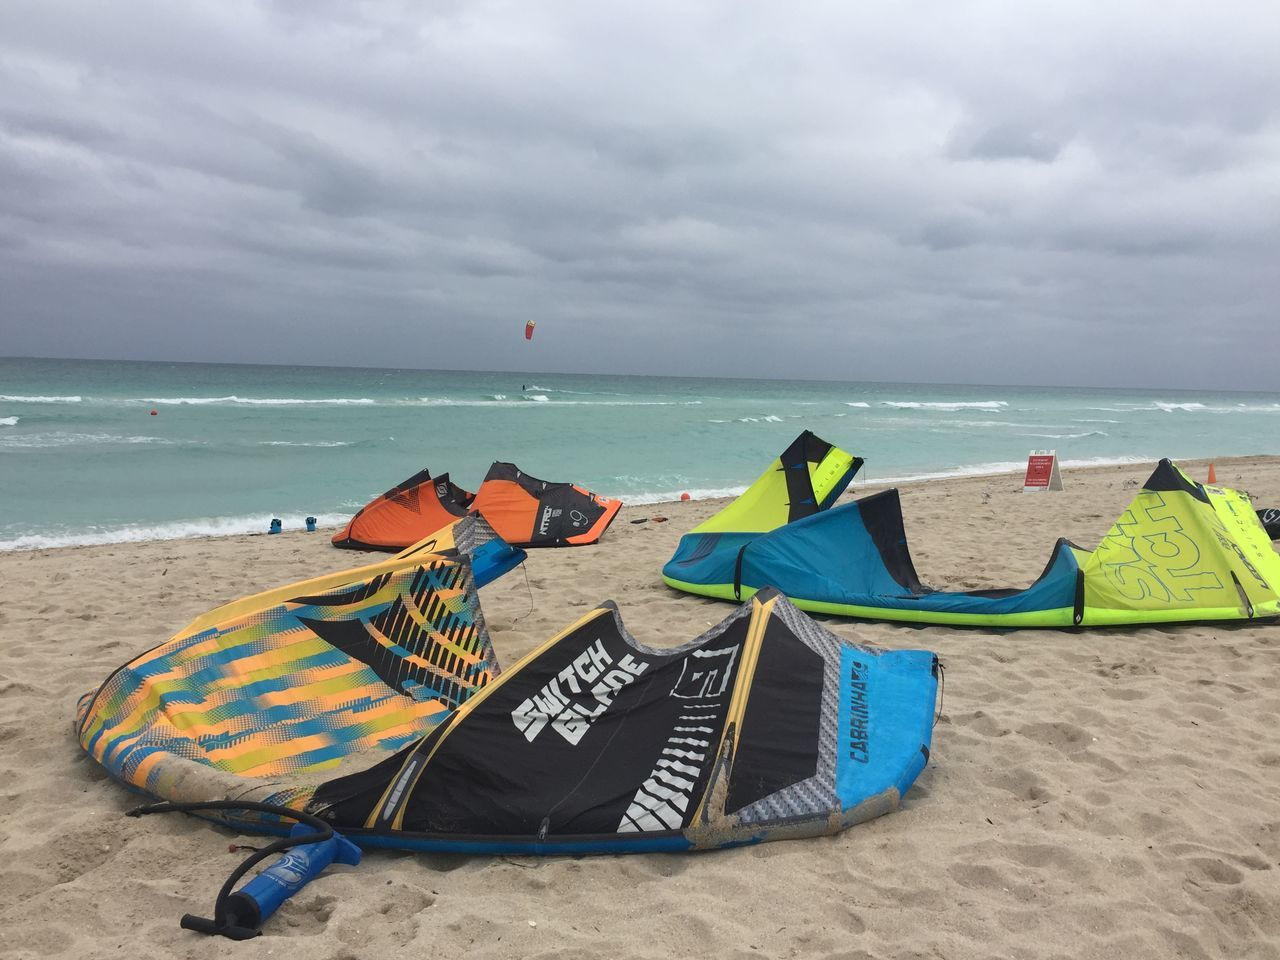 Kitesurfing Kitesurfing Miami Beach Kitesurfing Miami Myoffice Myofficetoday Feelinggrateful